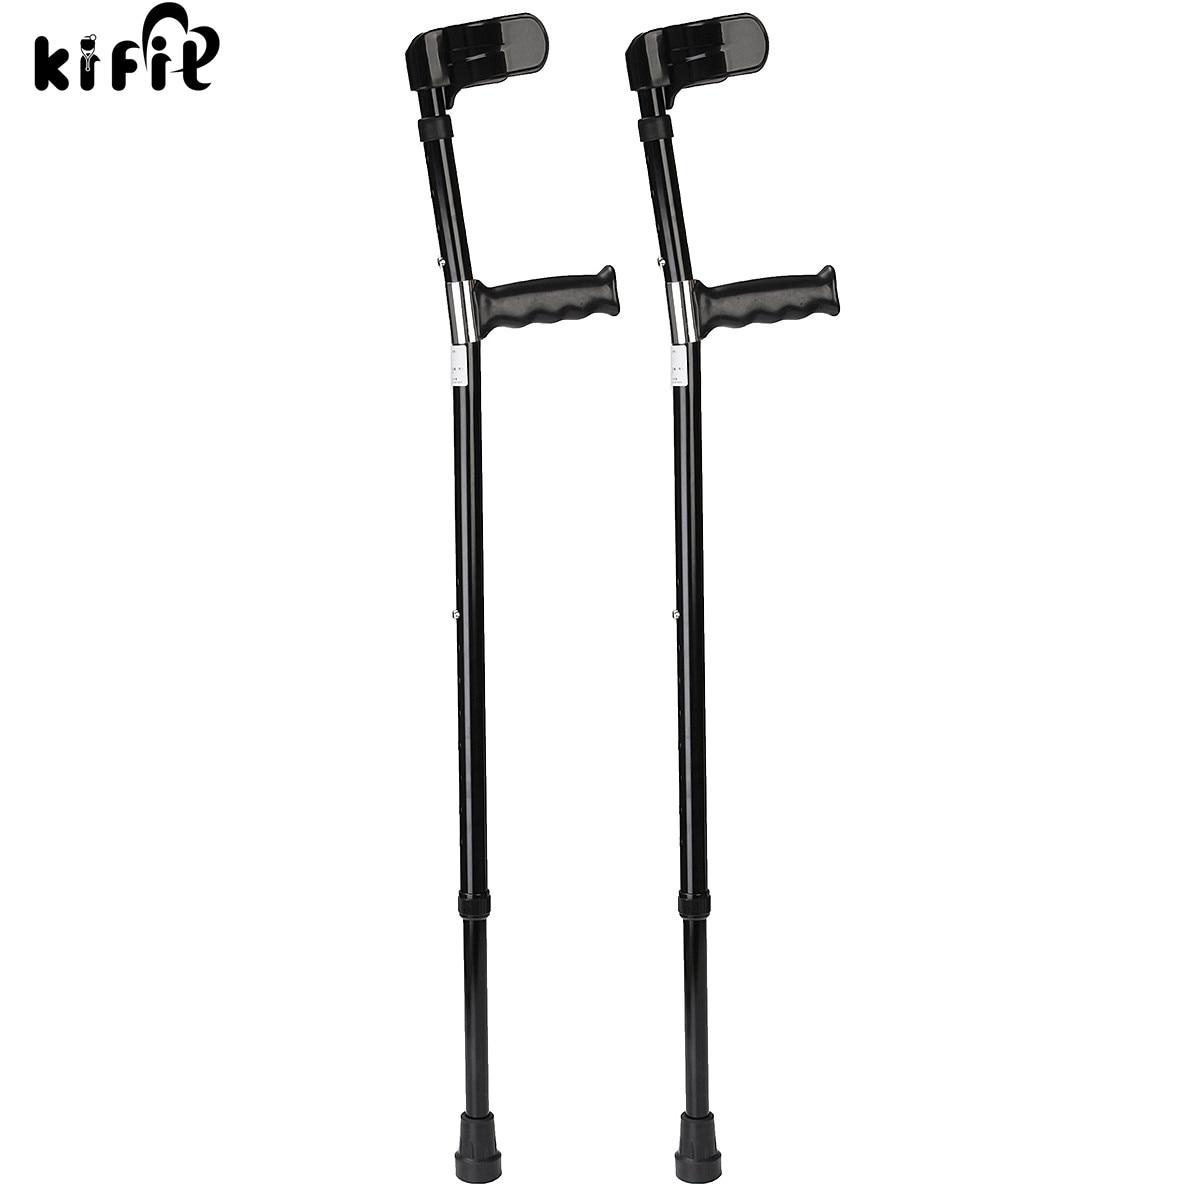 KIFIT 2PCS High Quality Aluminum Alloy Adjustable Forearm Crutches Elbow Auxiliary Equipment Personal Health Care Tool rebekka bakken rebekka bakken most personal 2 lp